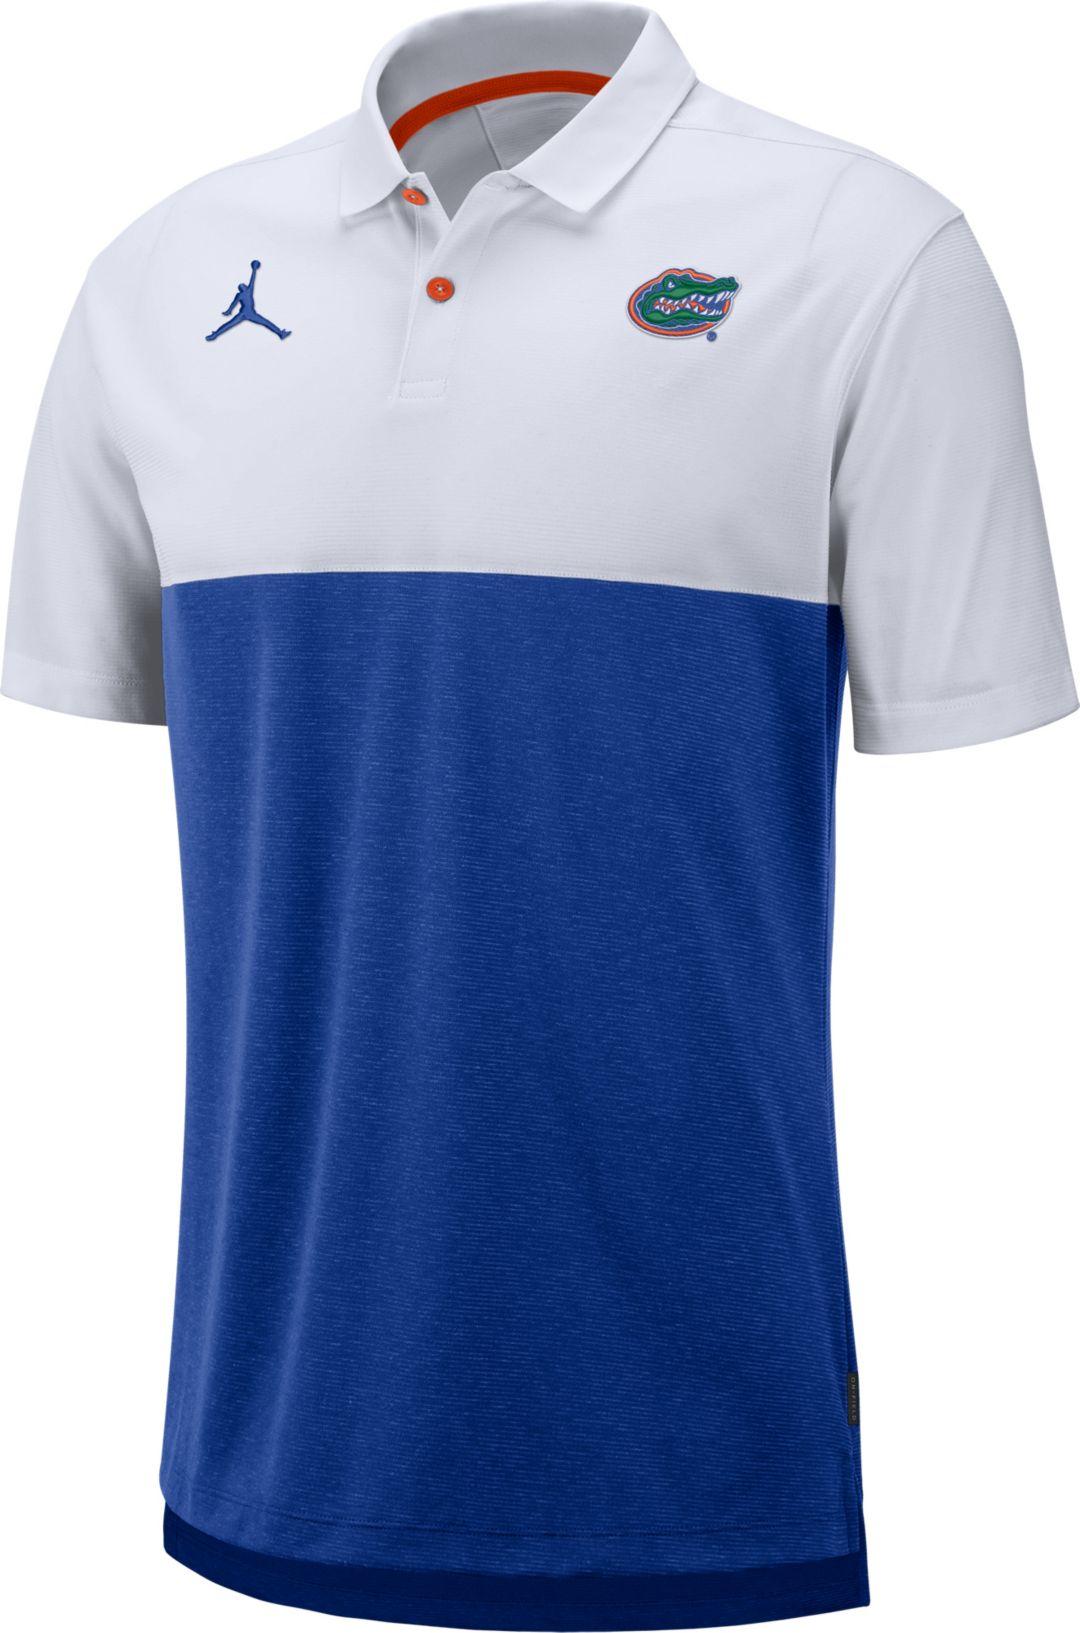 957ef5c35ea Jordan Men's Florida Gators White/Blue Dri-FIT Breathe Football Sideline  Polo 1